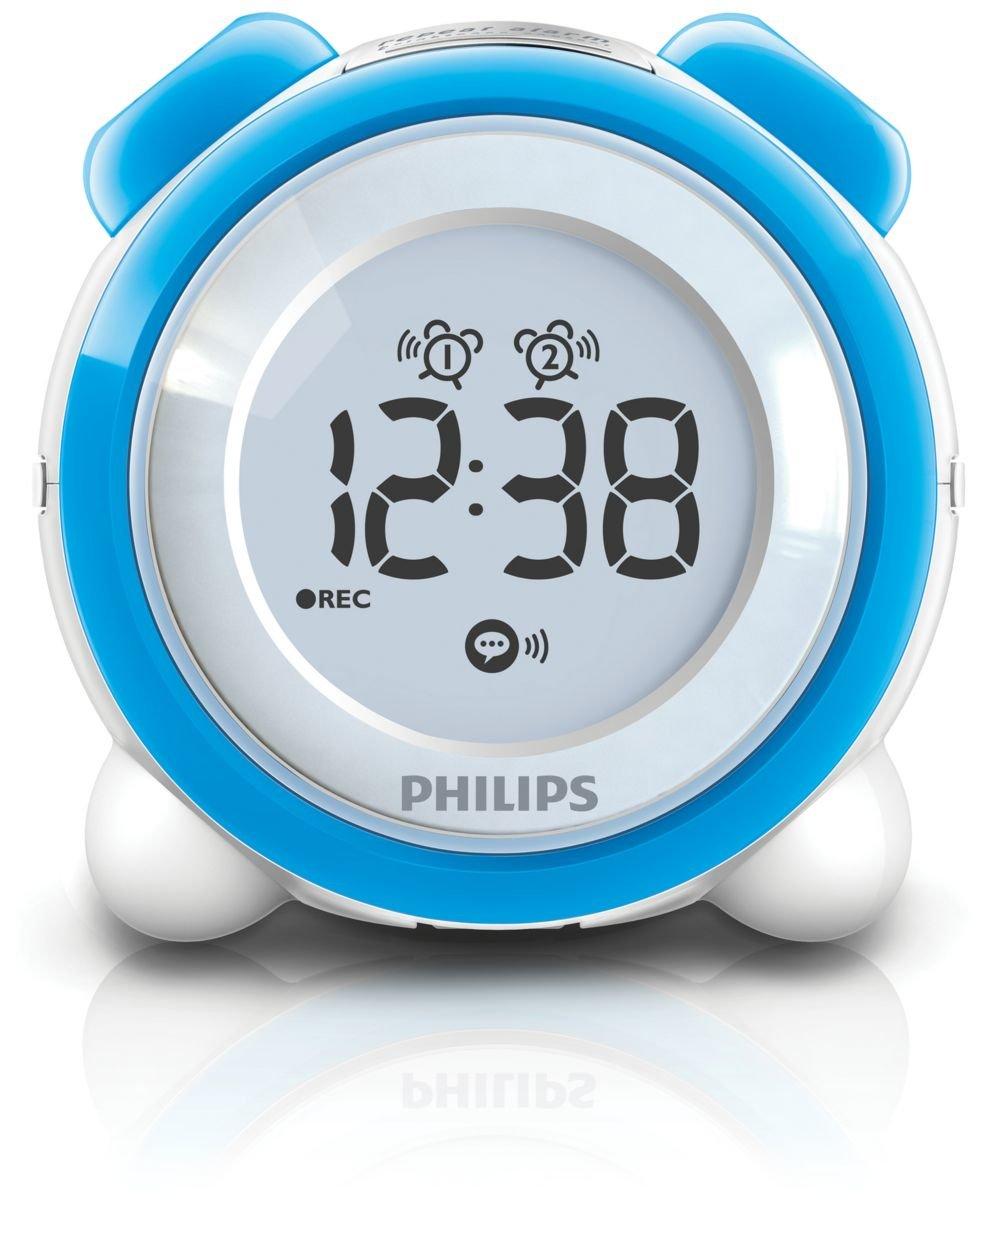 Philips - Radio (Reloj, LCD, AAA, Mono, FM, 100-240 V AC, 50/60 Hz): Amazon.es: Electrónica